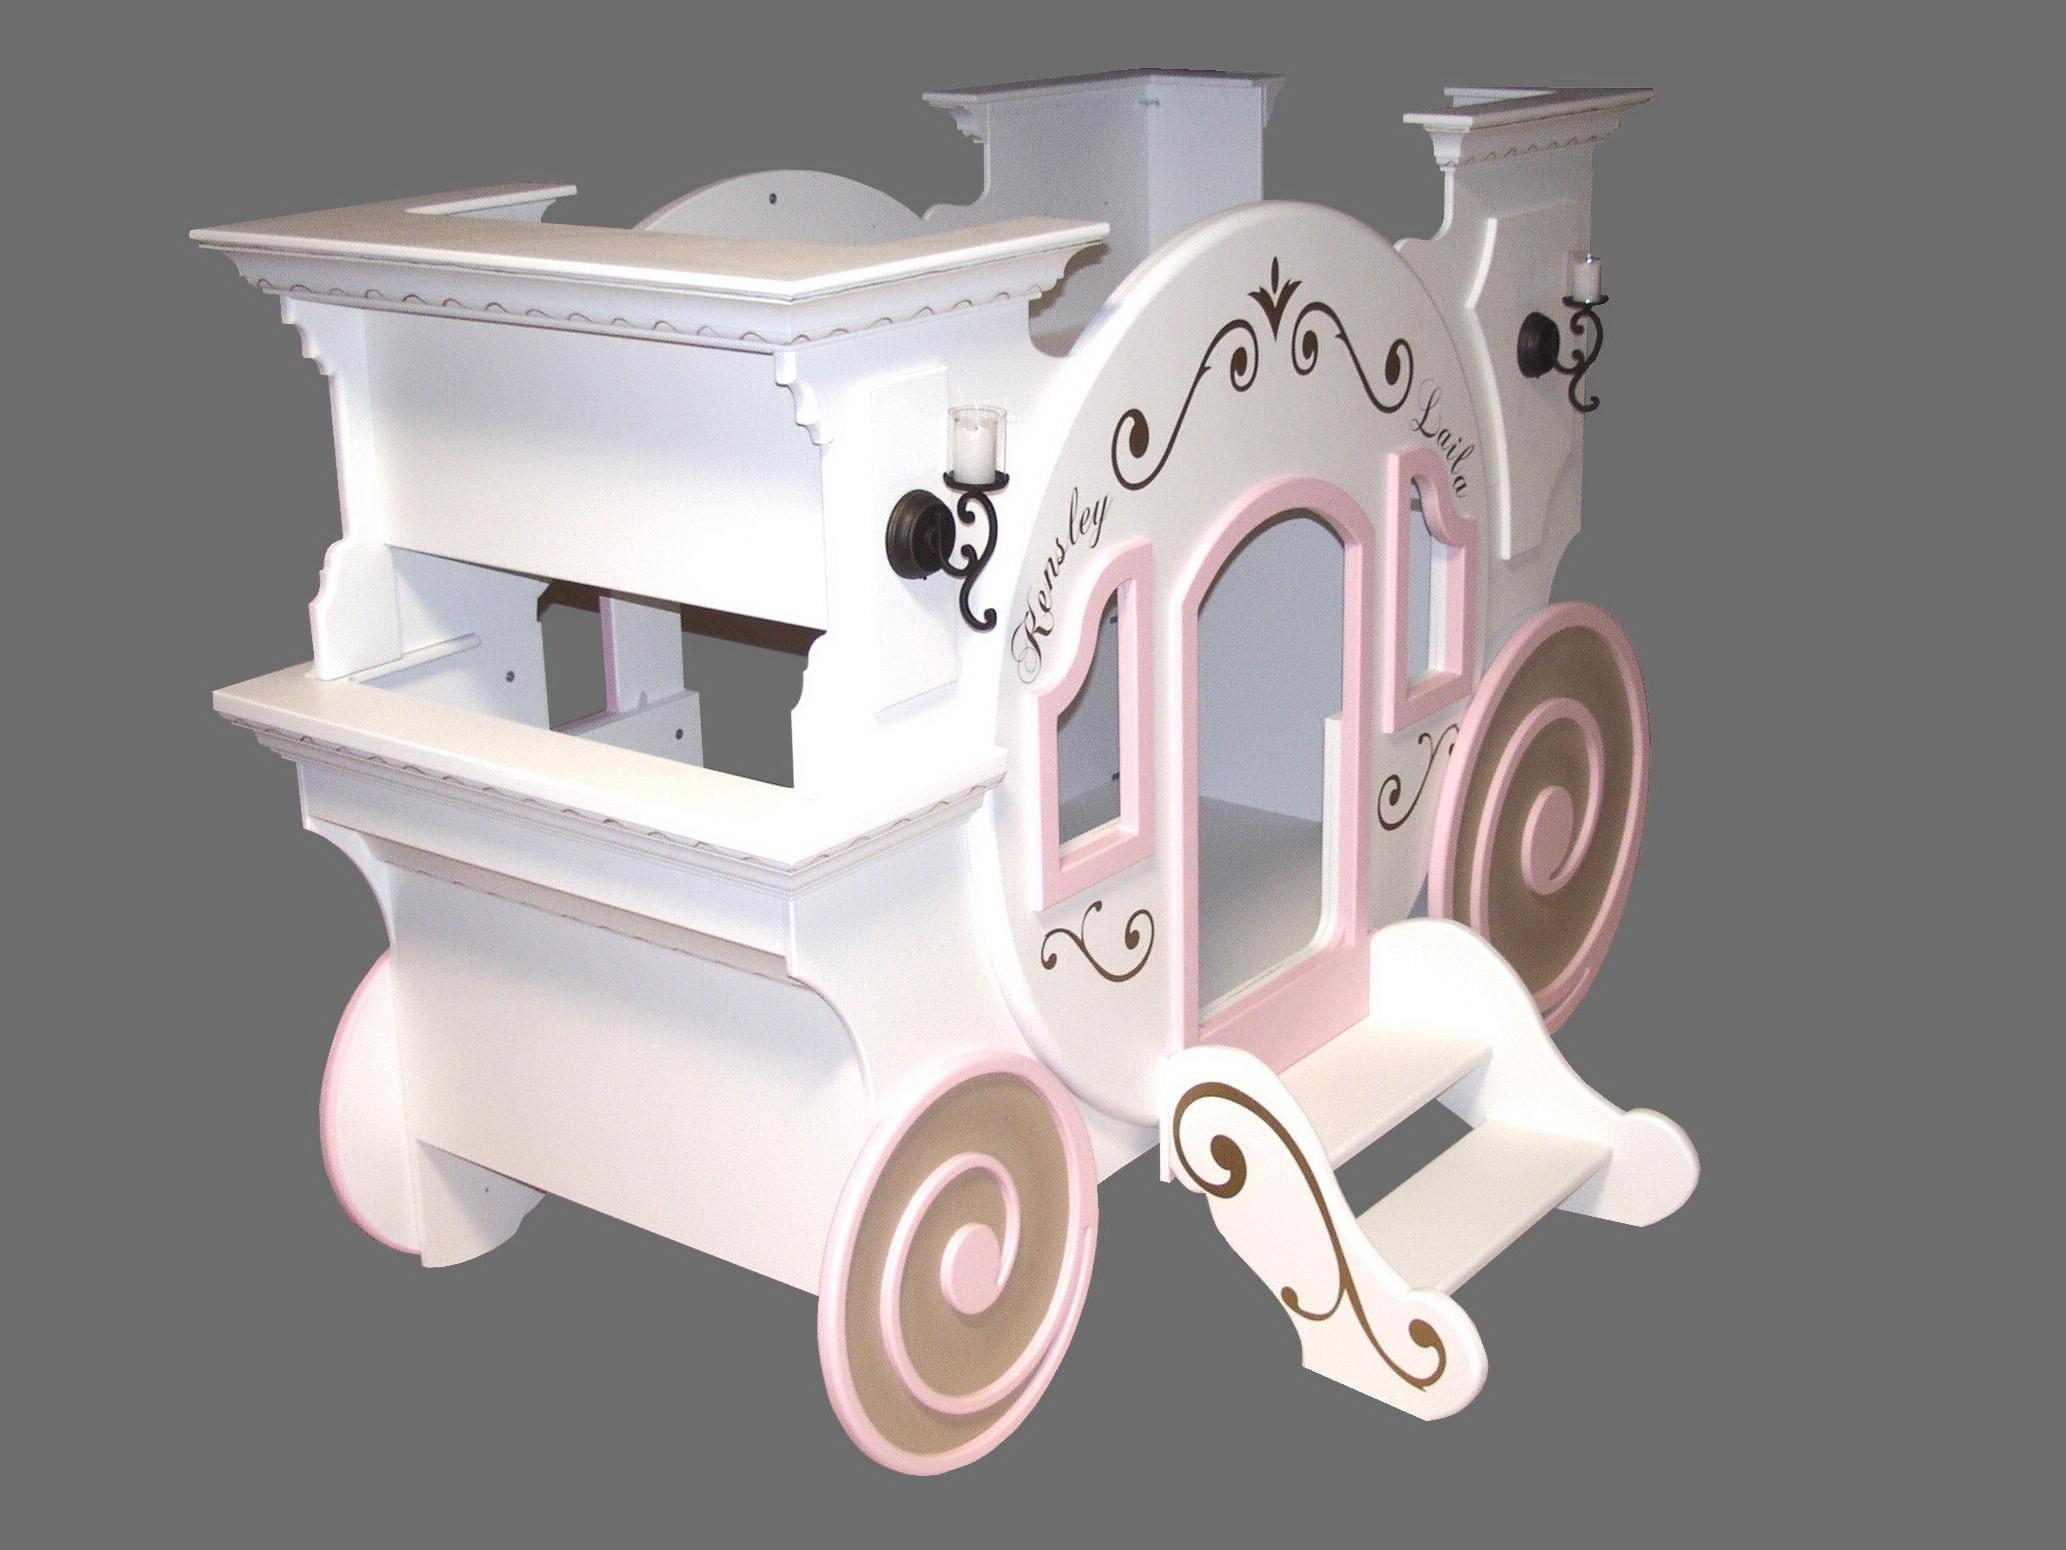 Blueprints for the Cinderella Princess Carriage Bunk Bed ...